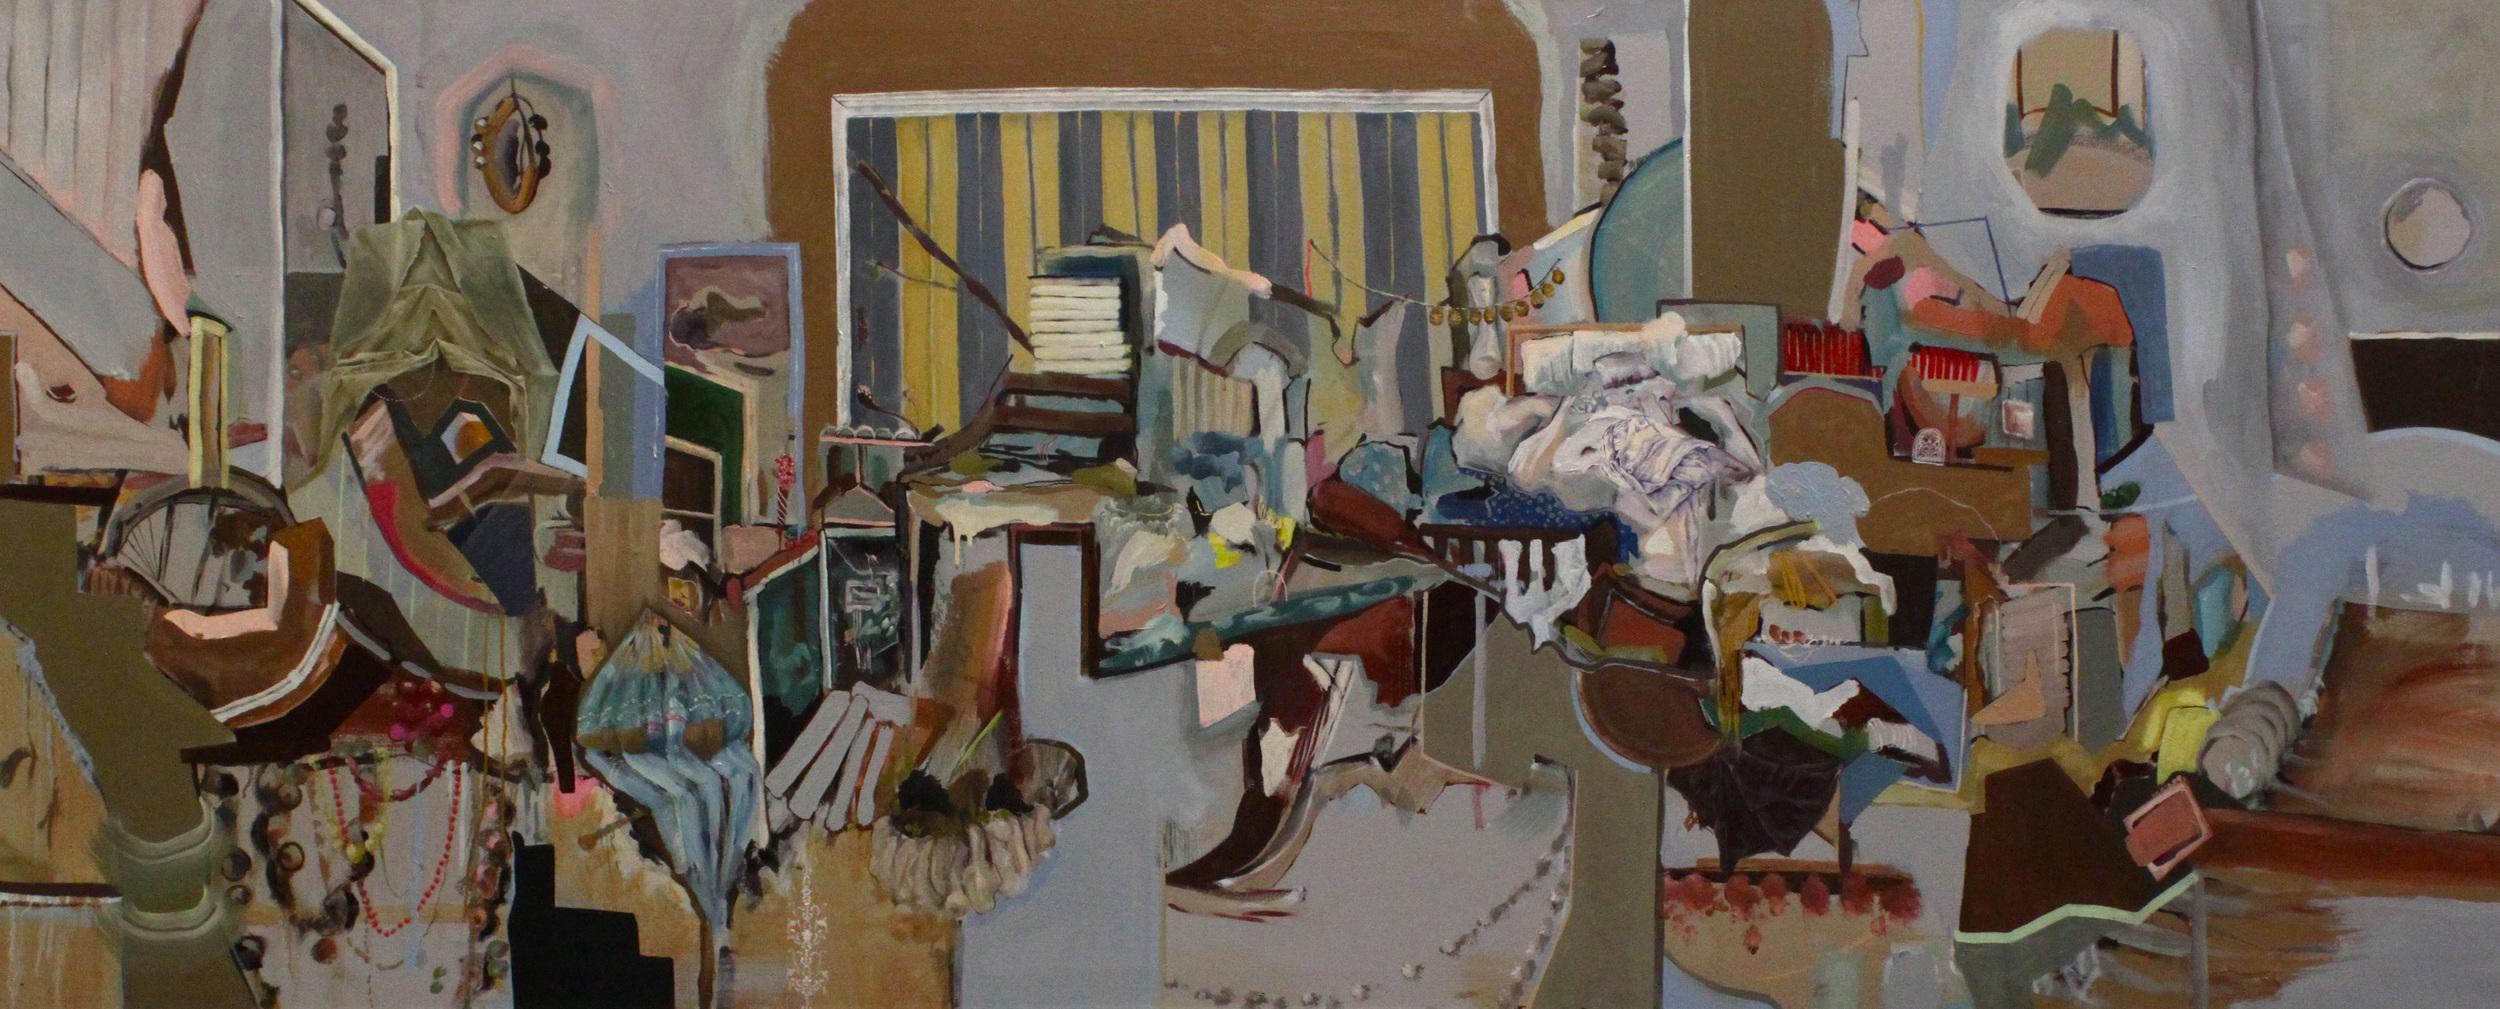 "'Steep', 96"" x 36"", Oil on Canvas, 2012"